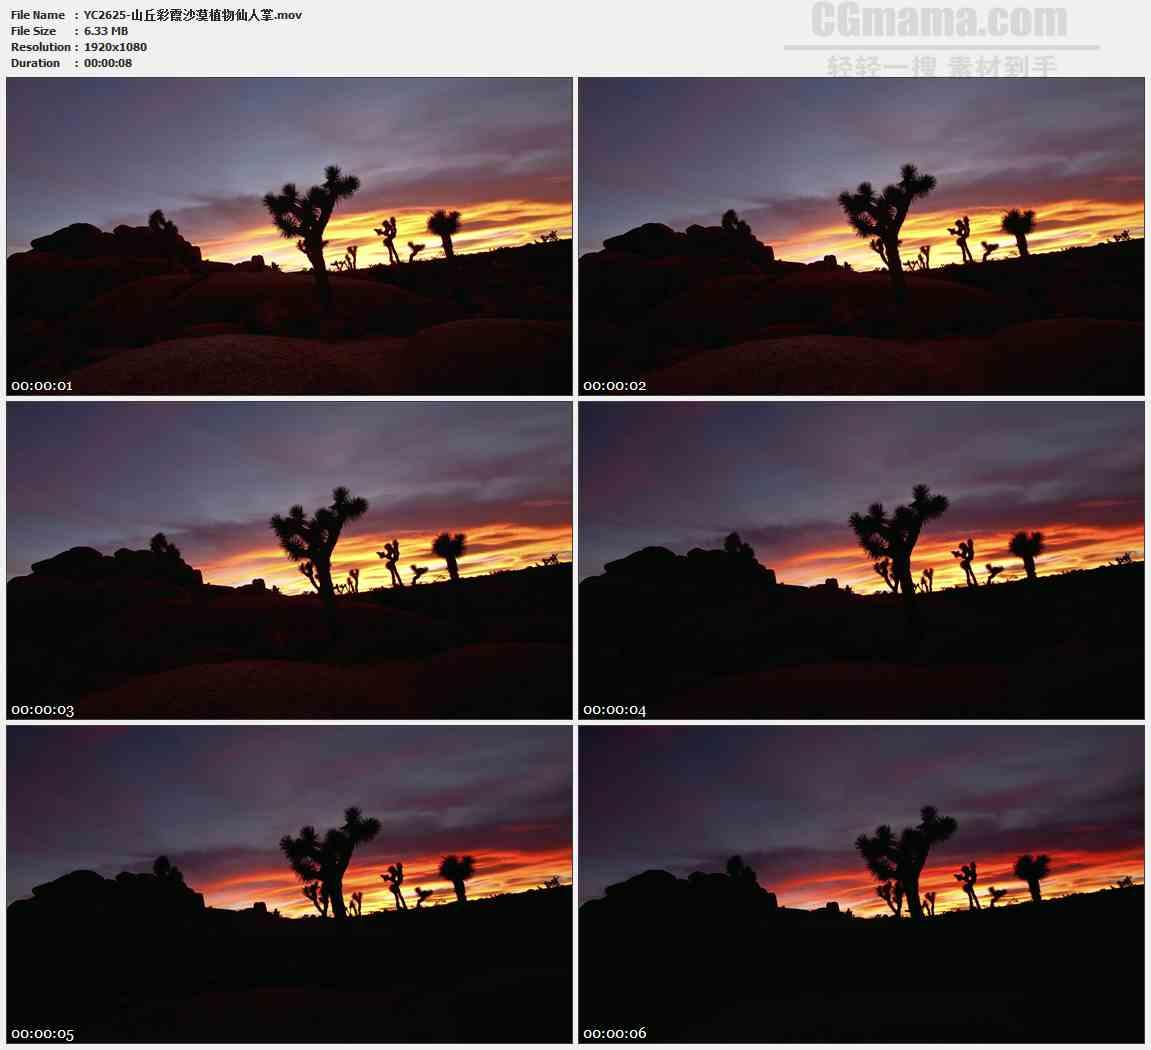 YC2625-山丘彩霞沙漠植物仙人掌高清实拍视频素材